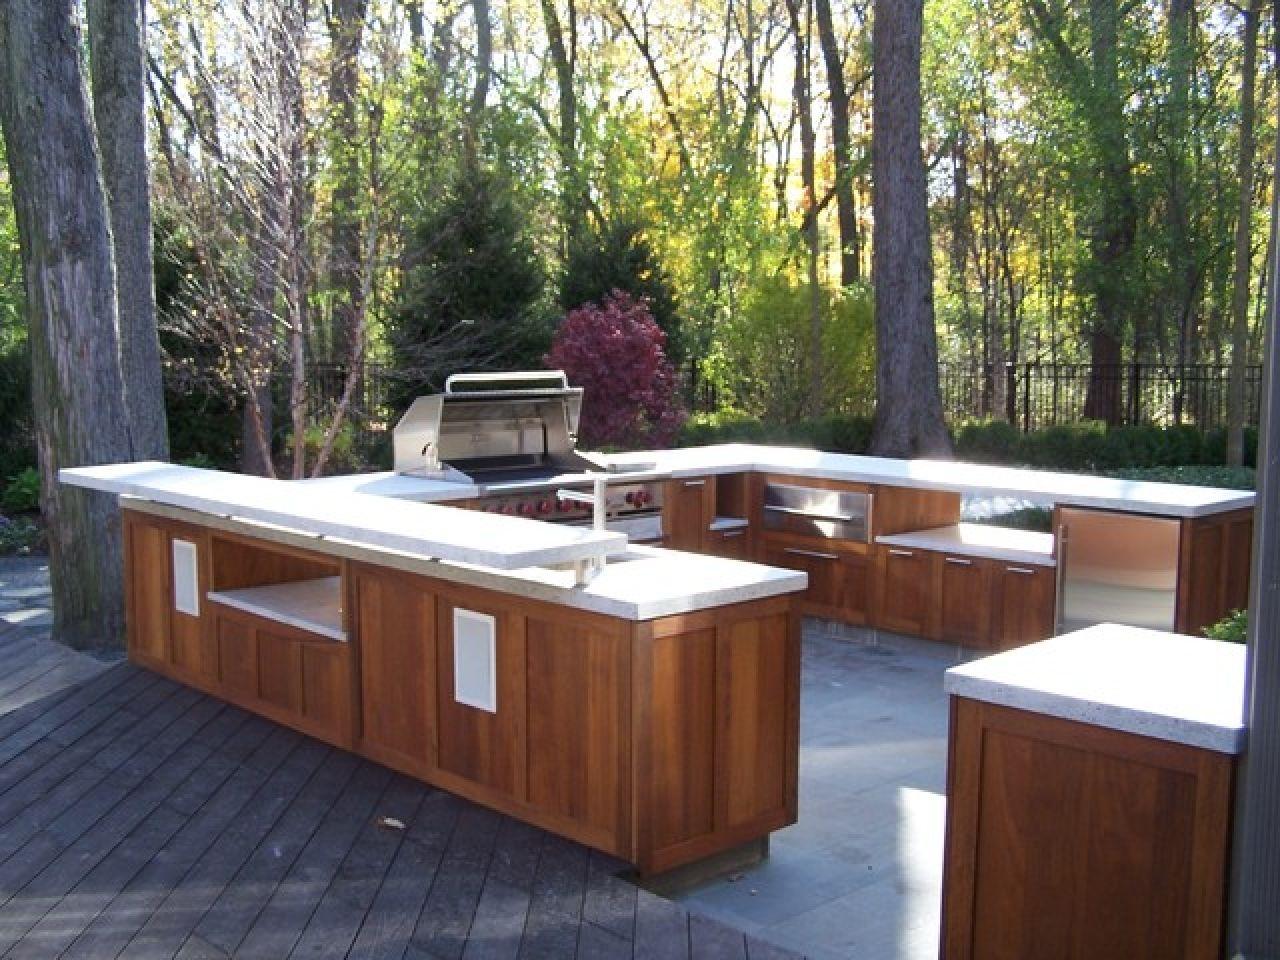 Image Result For Cedar Outdoor Kitchens Outdoor Kitchen Wood